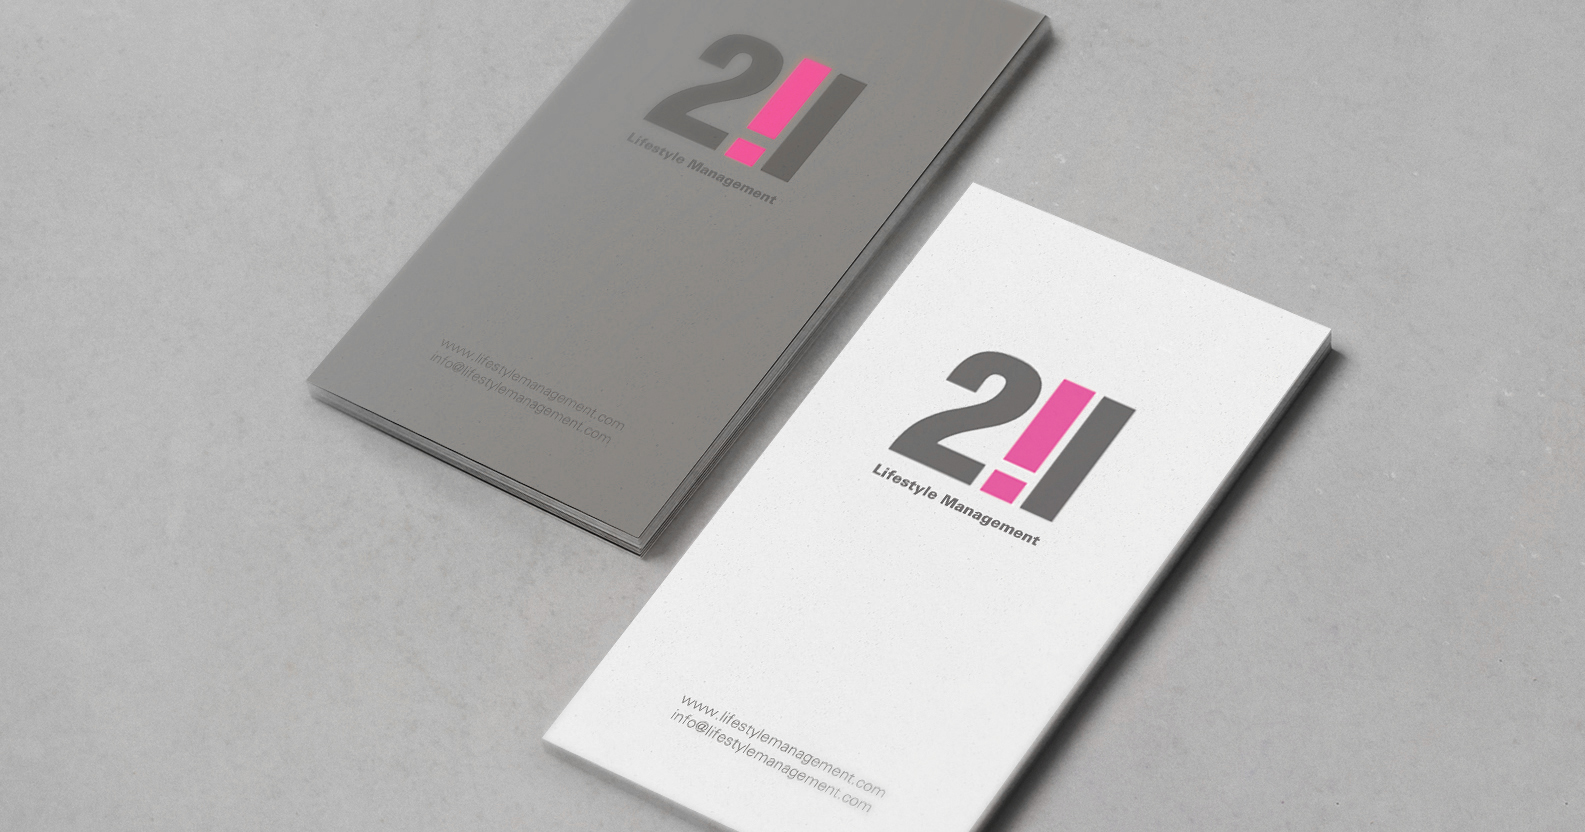 Design-Grafico-Graphic-Design-Logotipo-Logo-Identidade-Branding-Cartoes-Business-Cards-Lifestyle-Management-bonjourmolotov.jpg